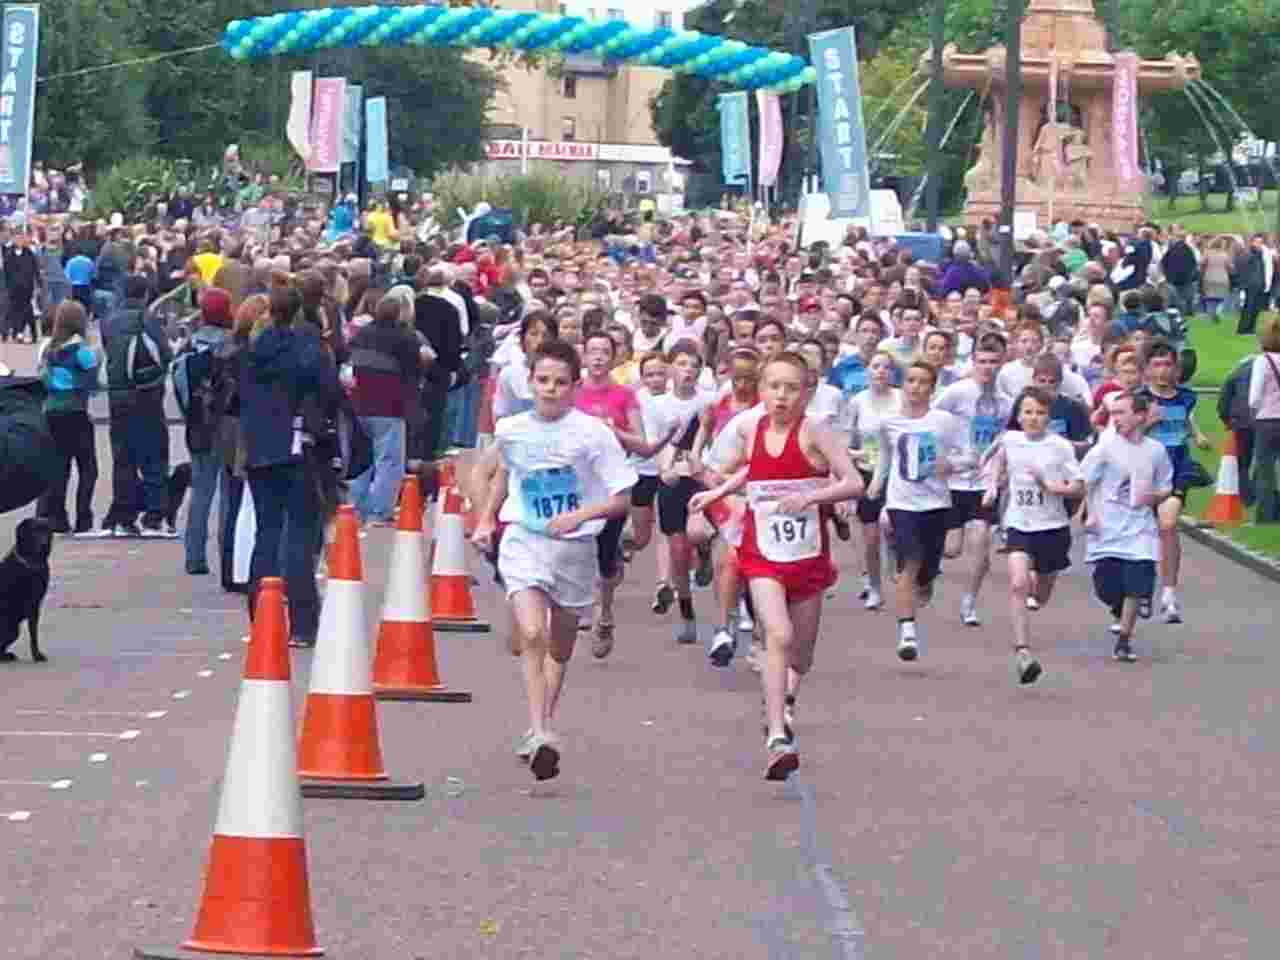 2008-great-scottish-run-04